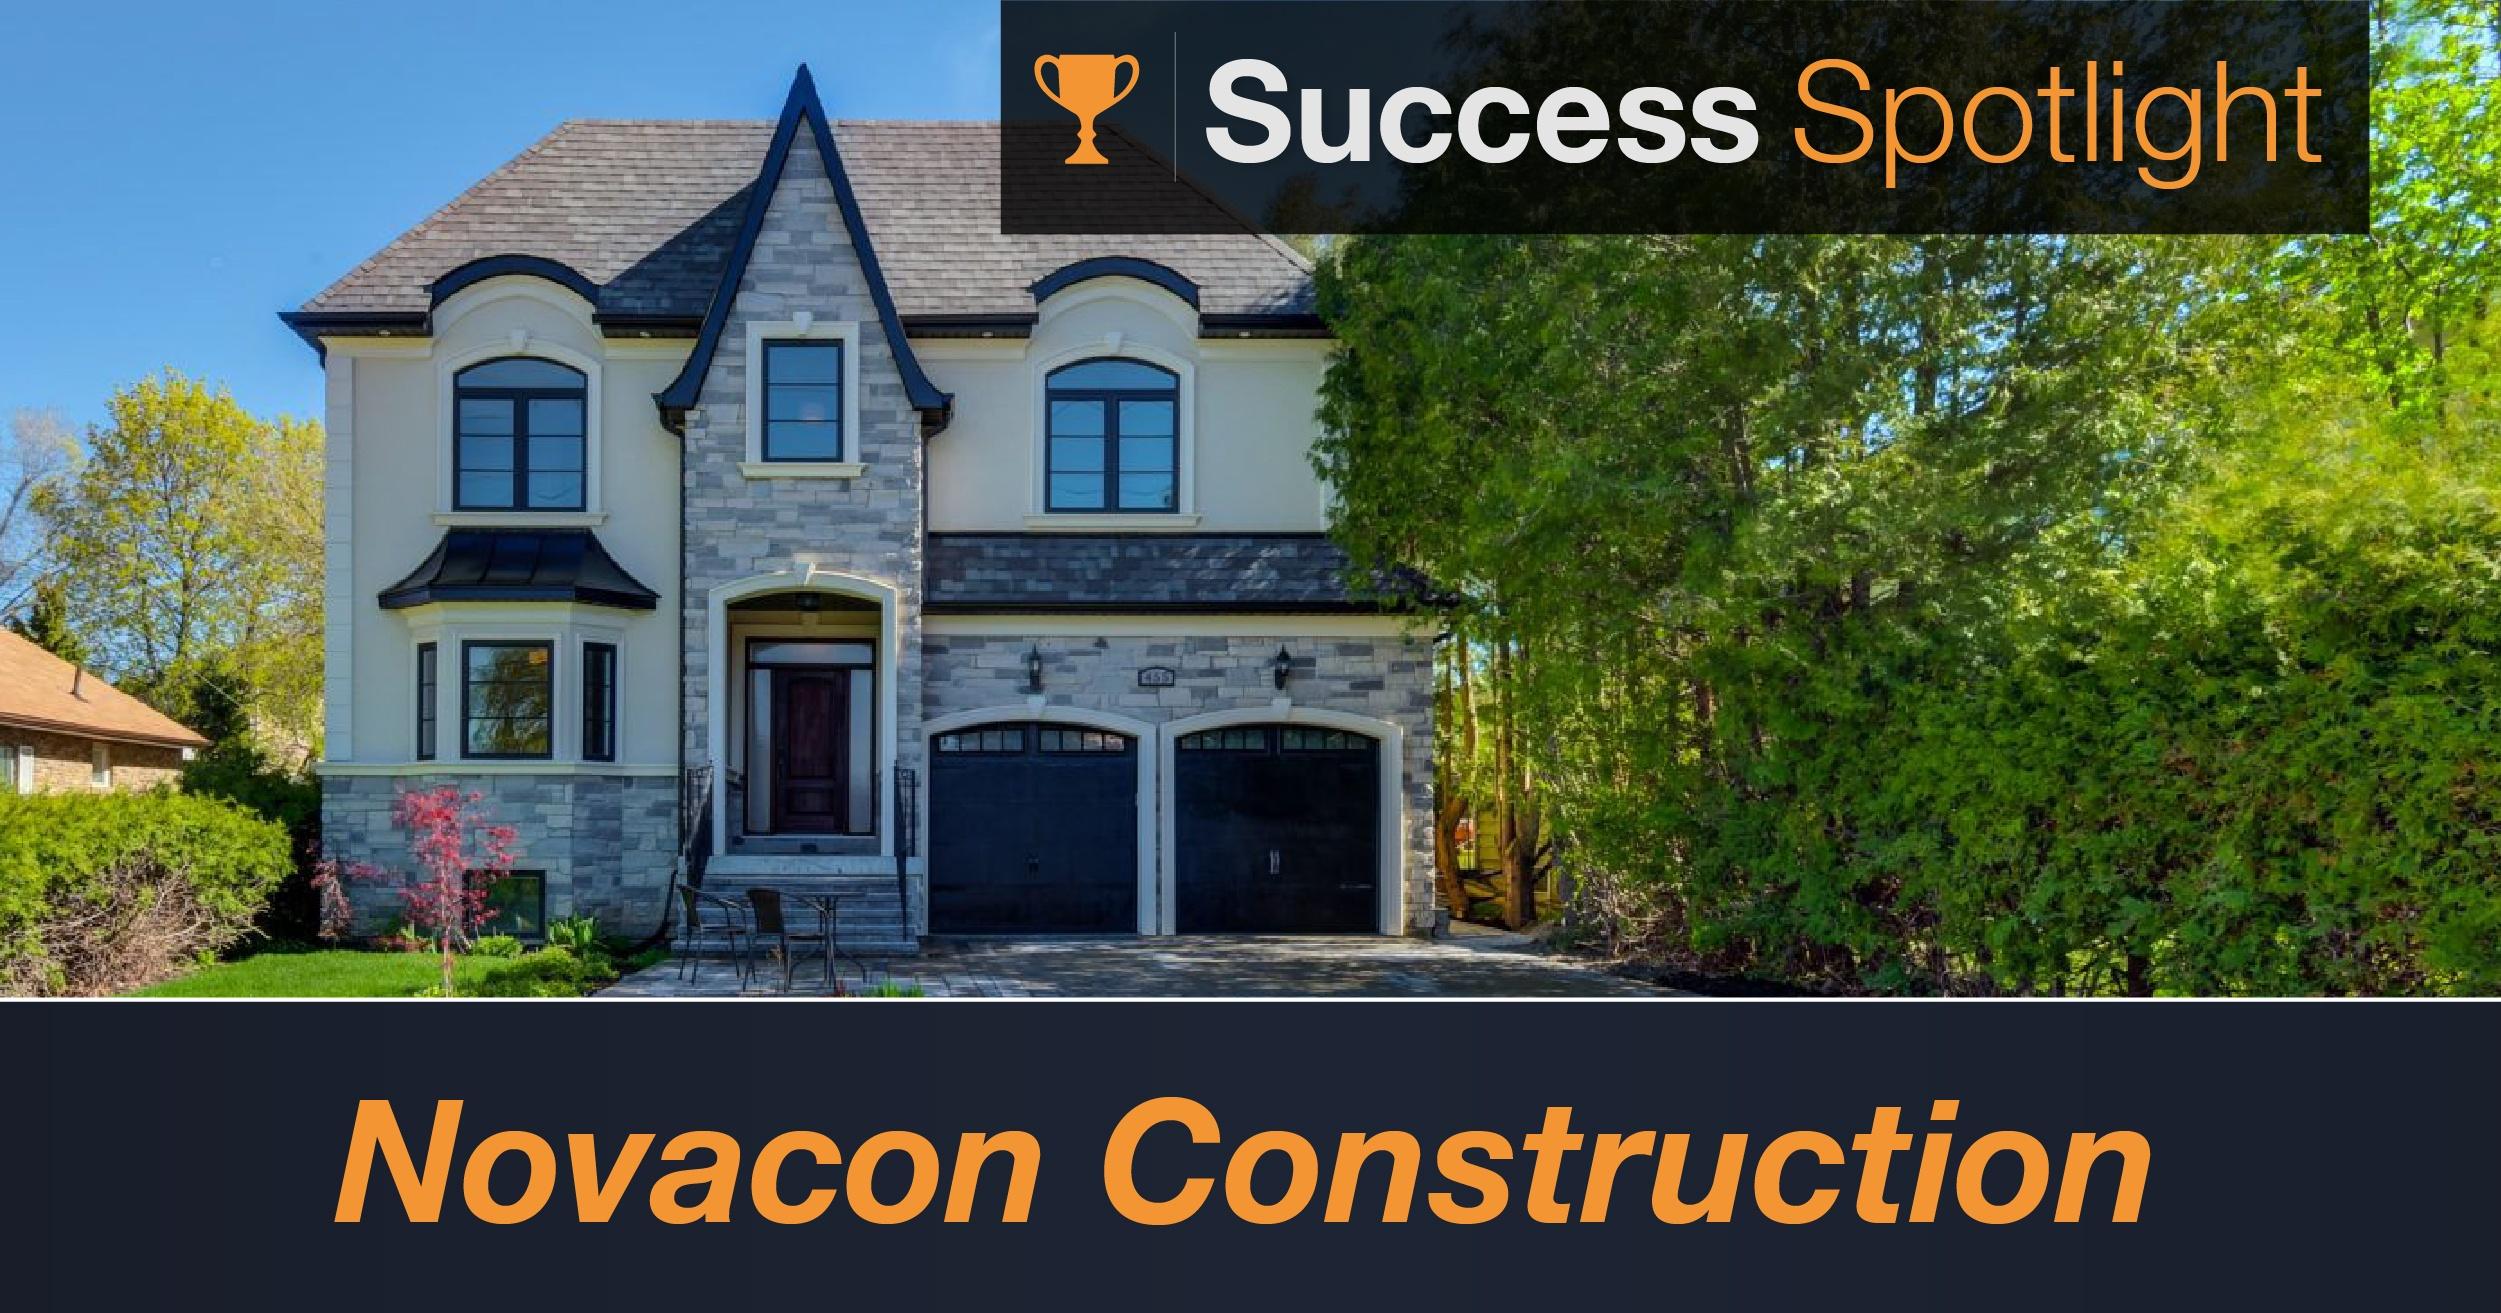 Success Spotlight: Novacon Construction